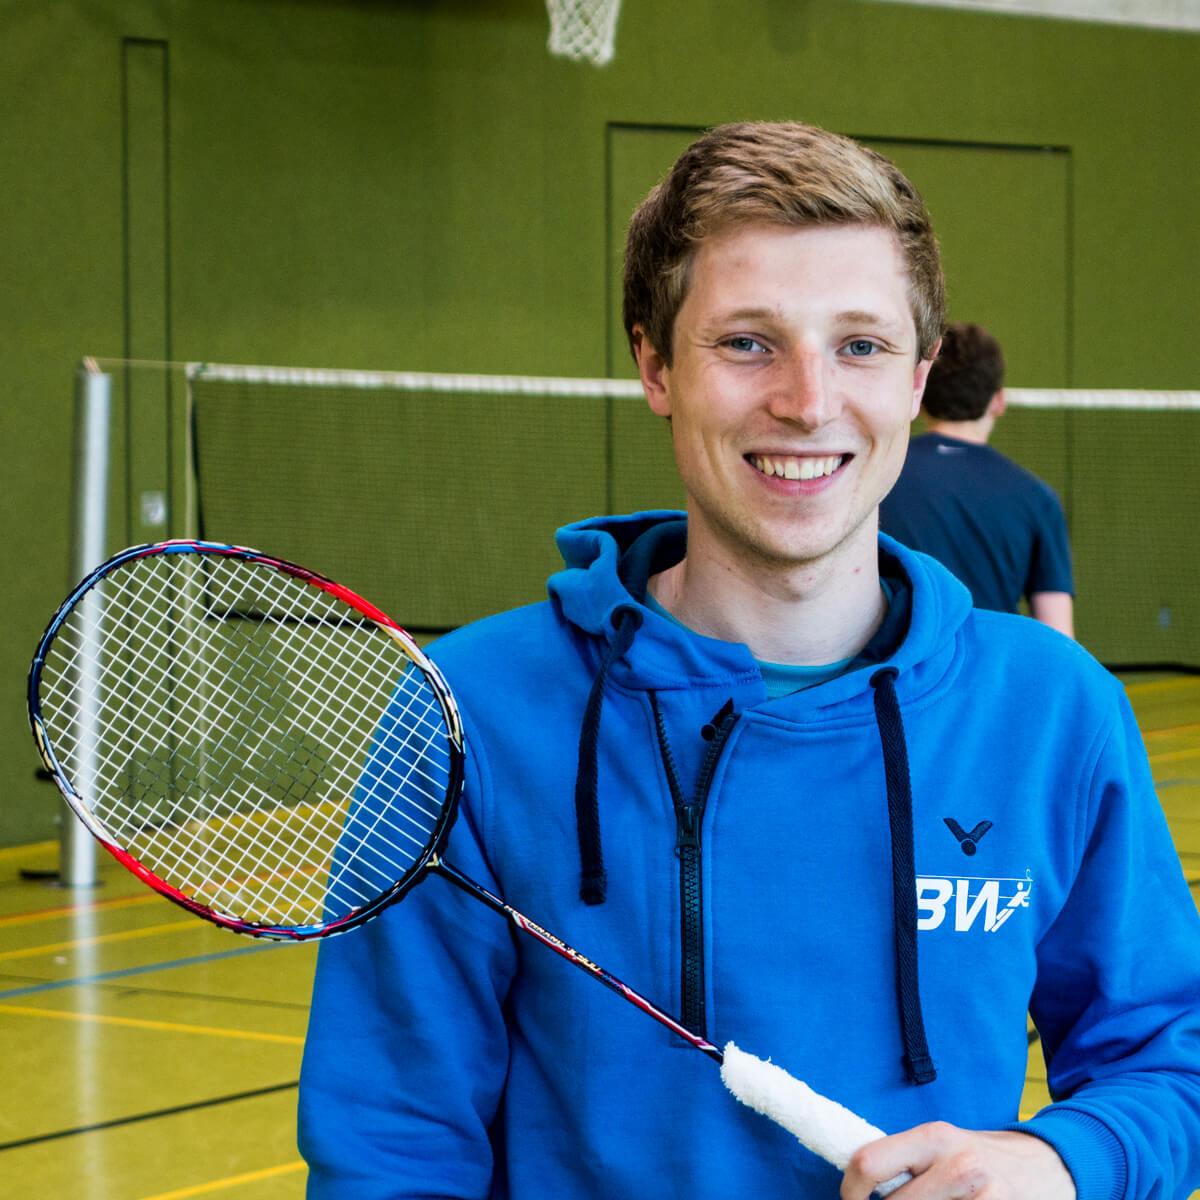 Badminton Verein Münster